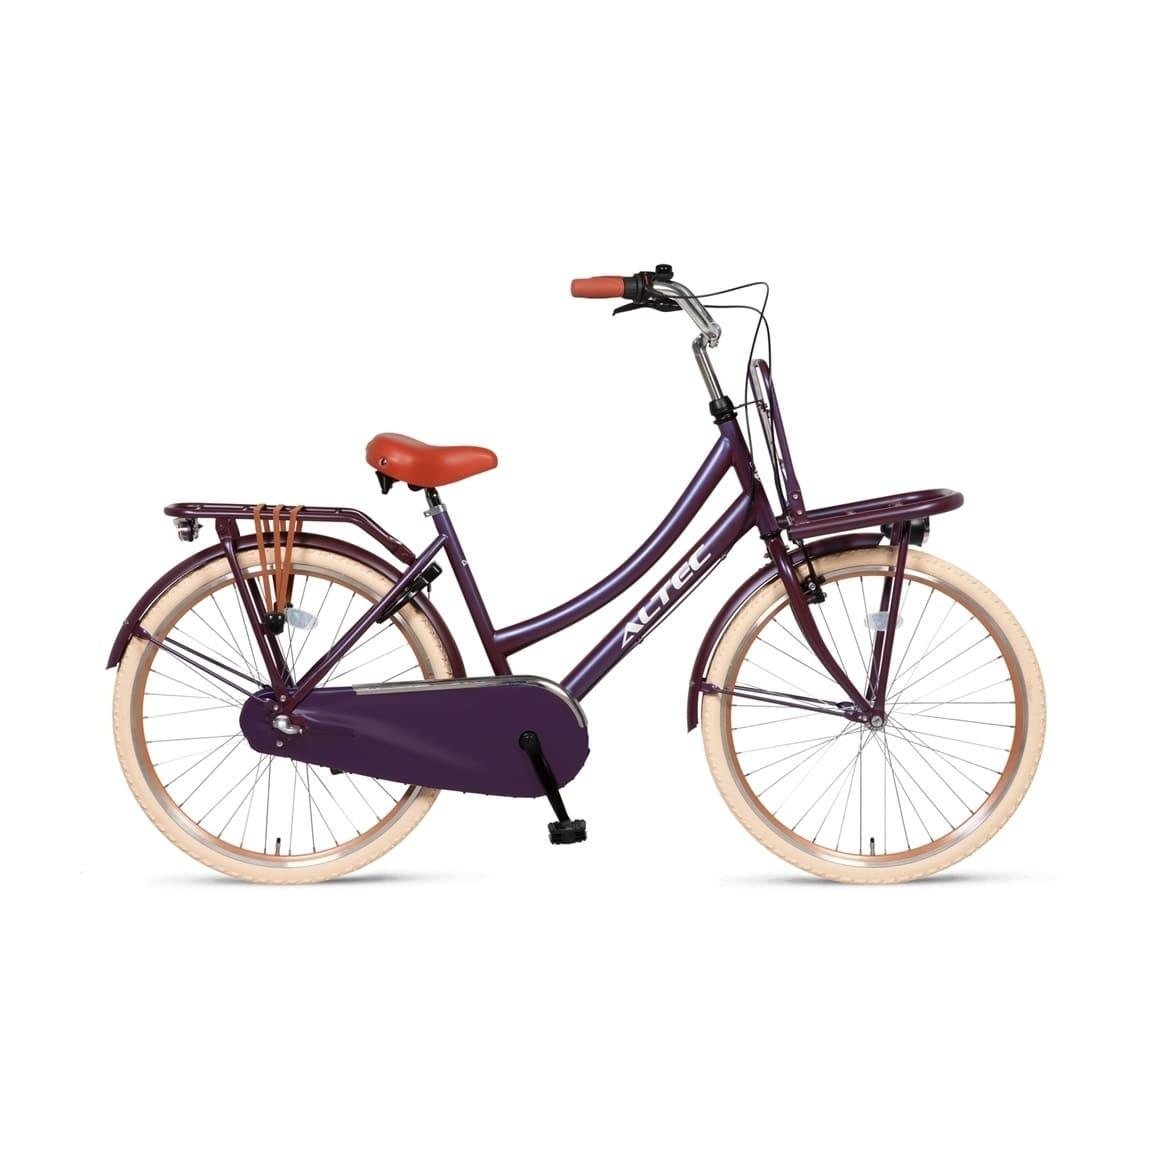 Altec-Dutch-24inch-Transportfiets-N3-Violet-Nieuw-2019-min